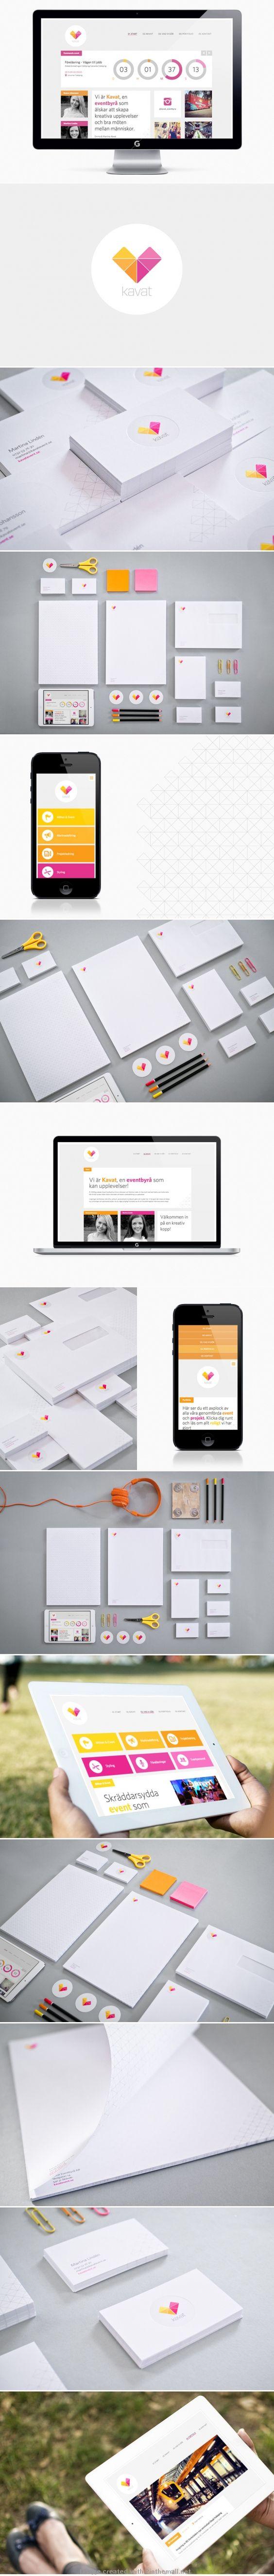 Kavat corporate identity logo business card letterhead website design